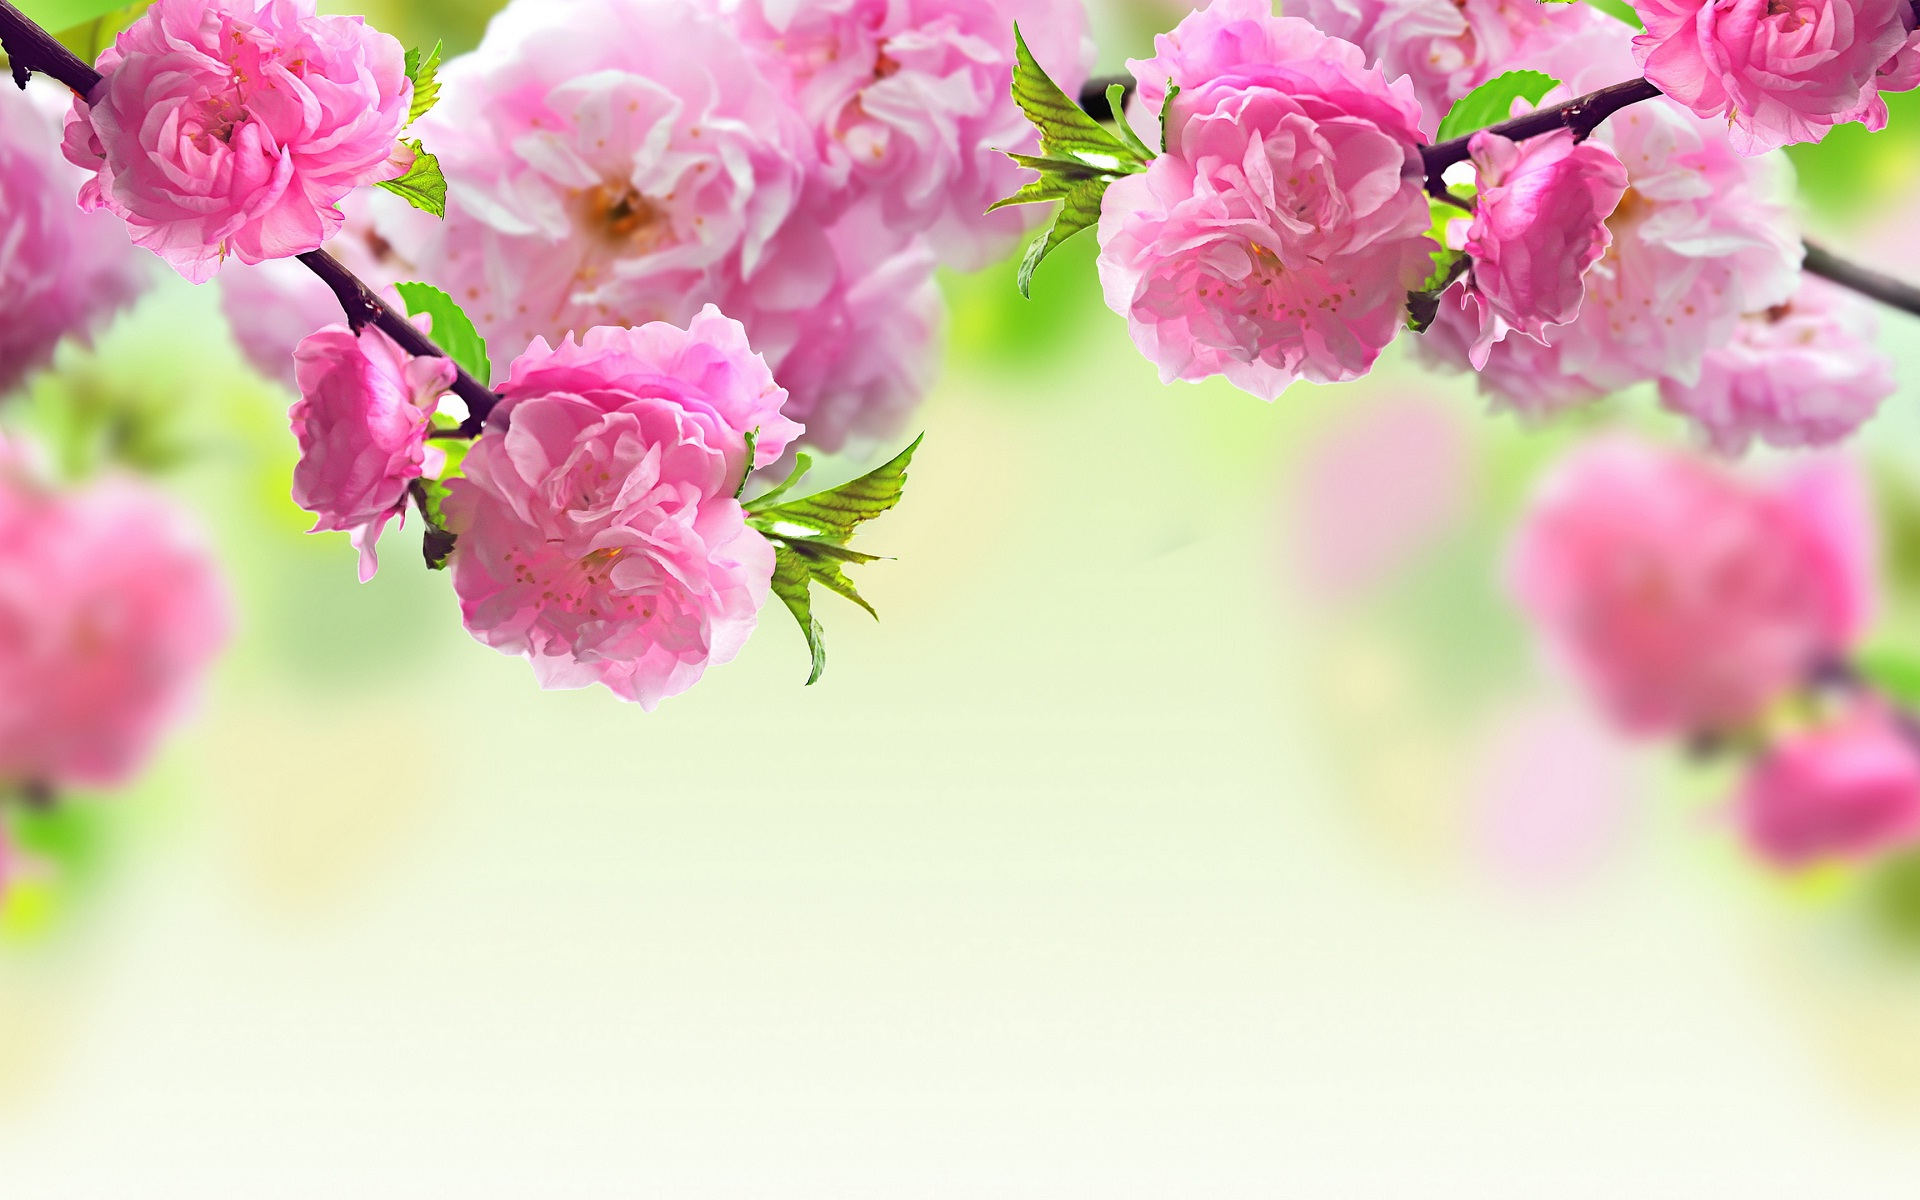 pink most beautiful flowers wallapper HD Wallpapers Rocks 1920x1200